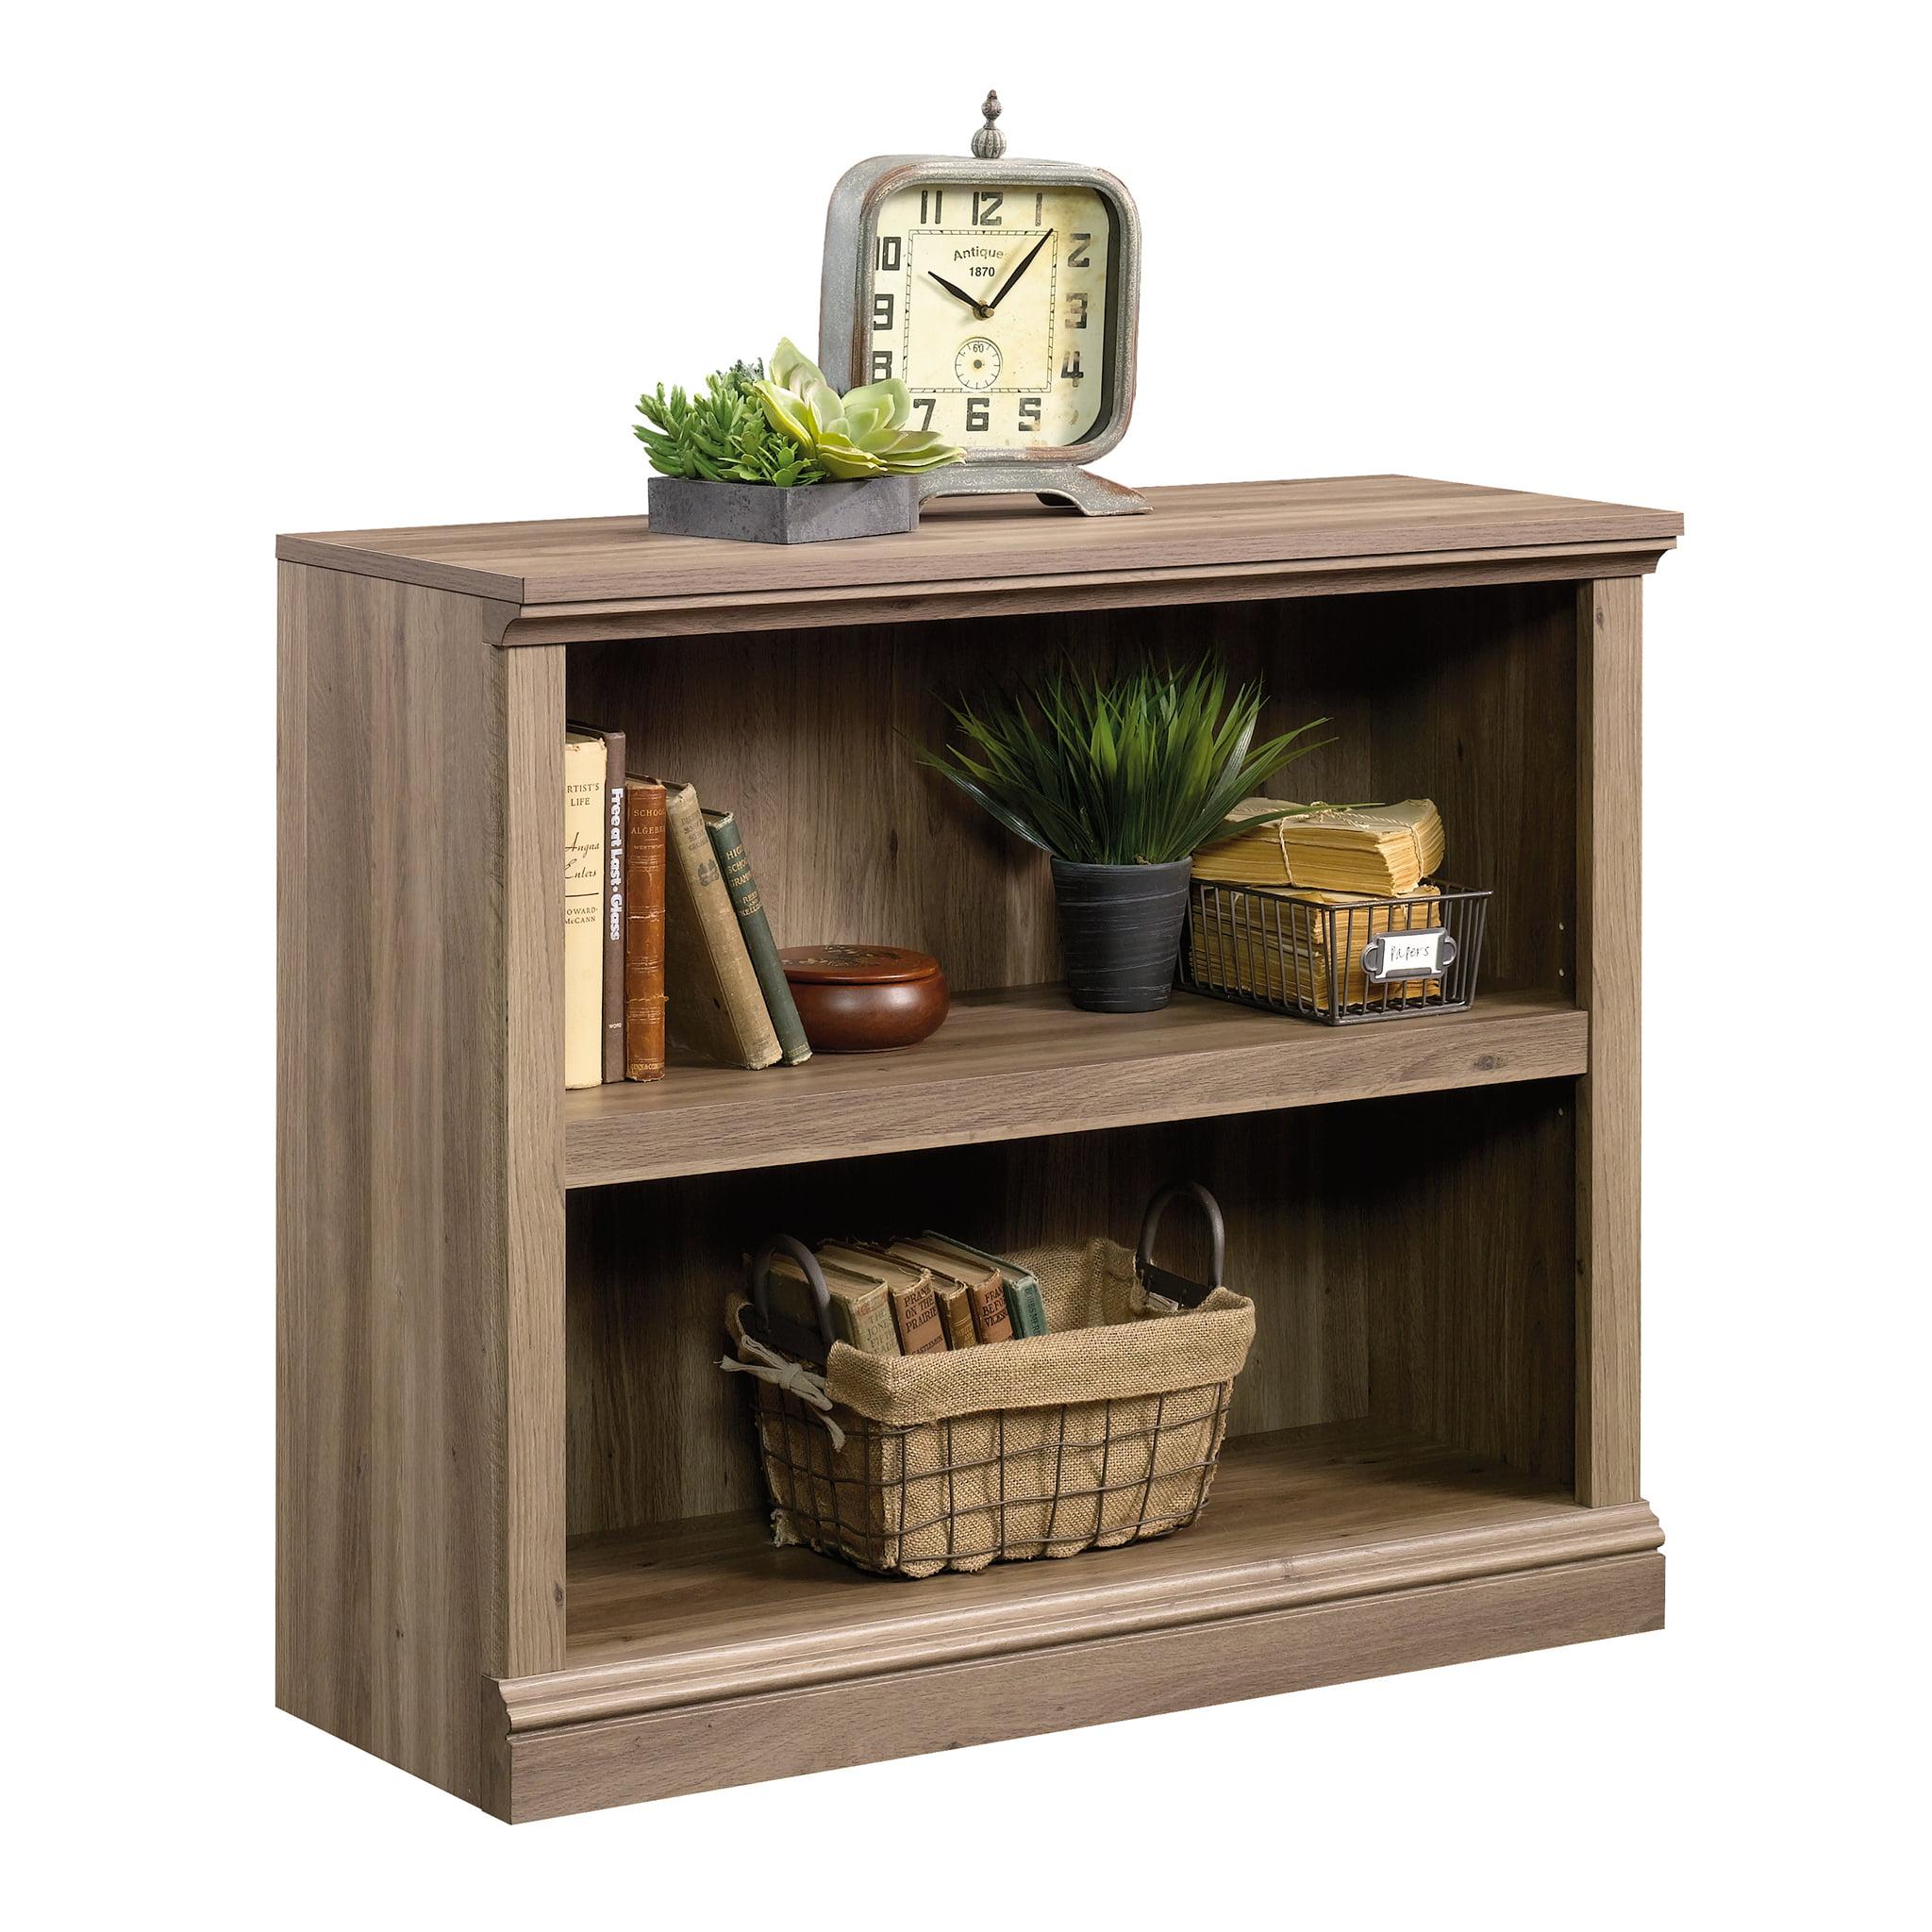 Sauder Select 2 Shelf Bookcase, Multiple Finishes by Sauder